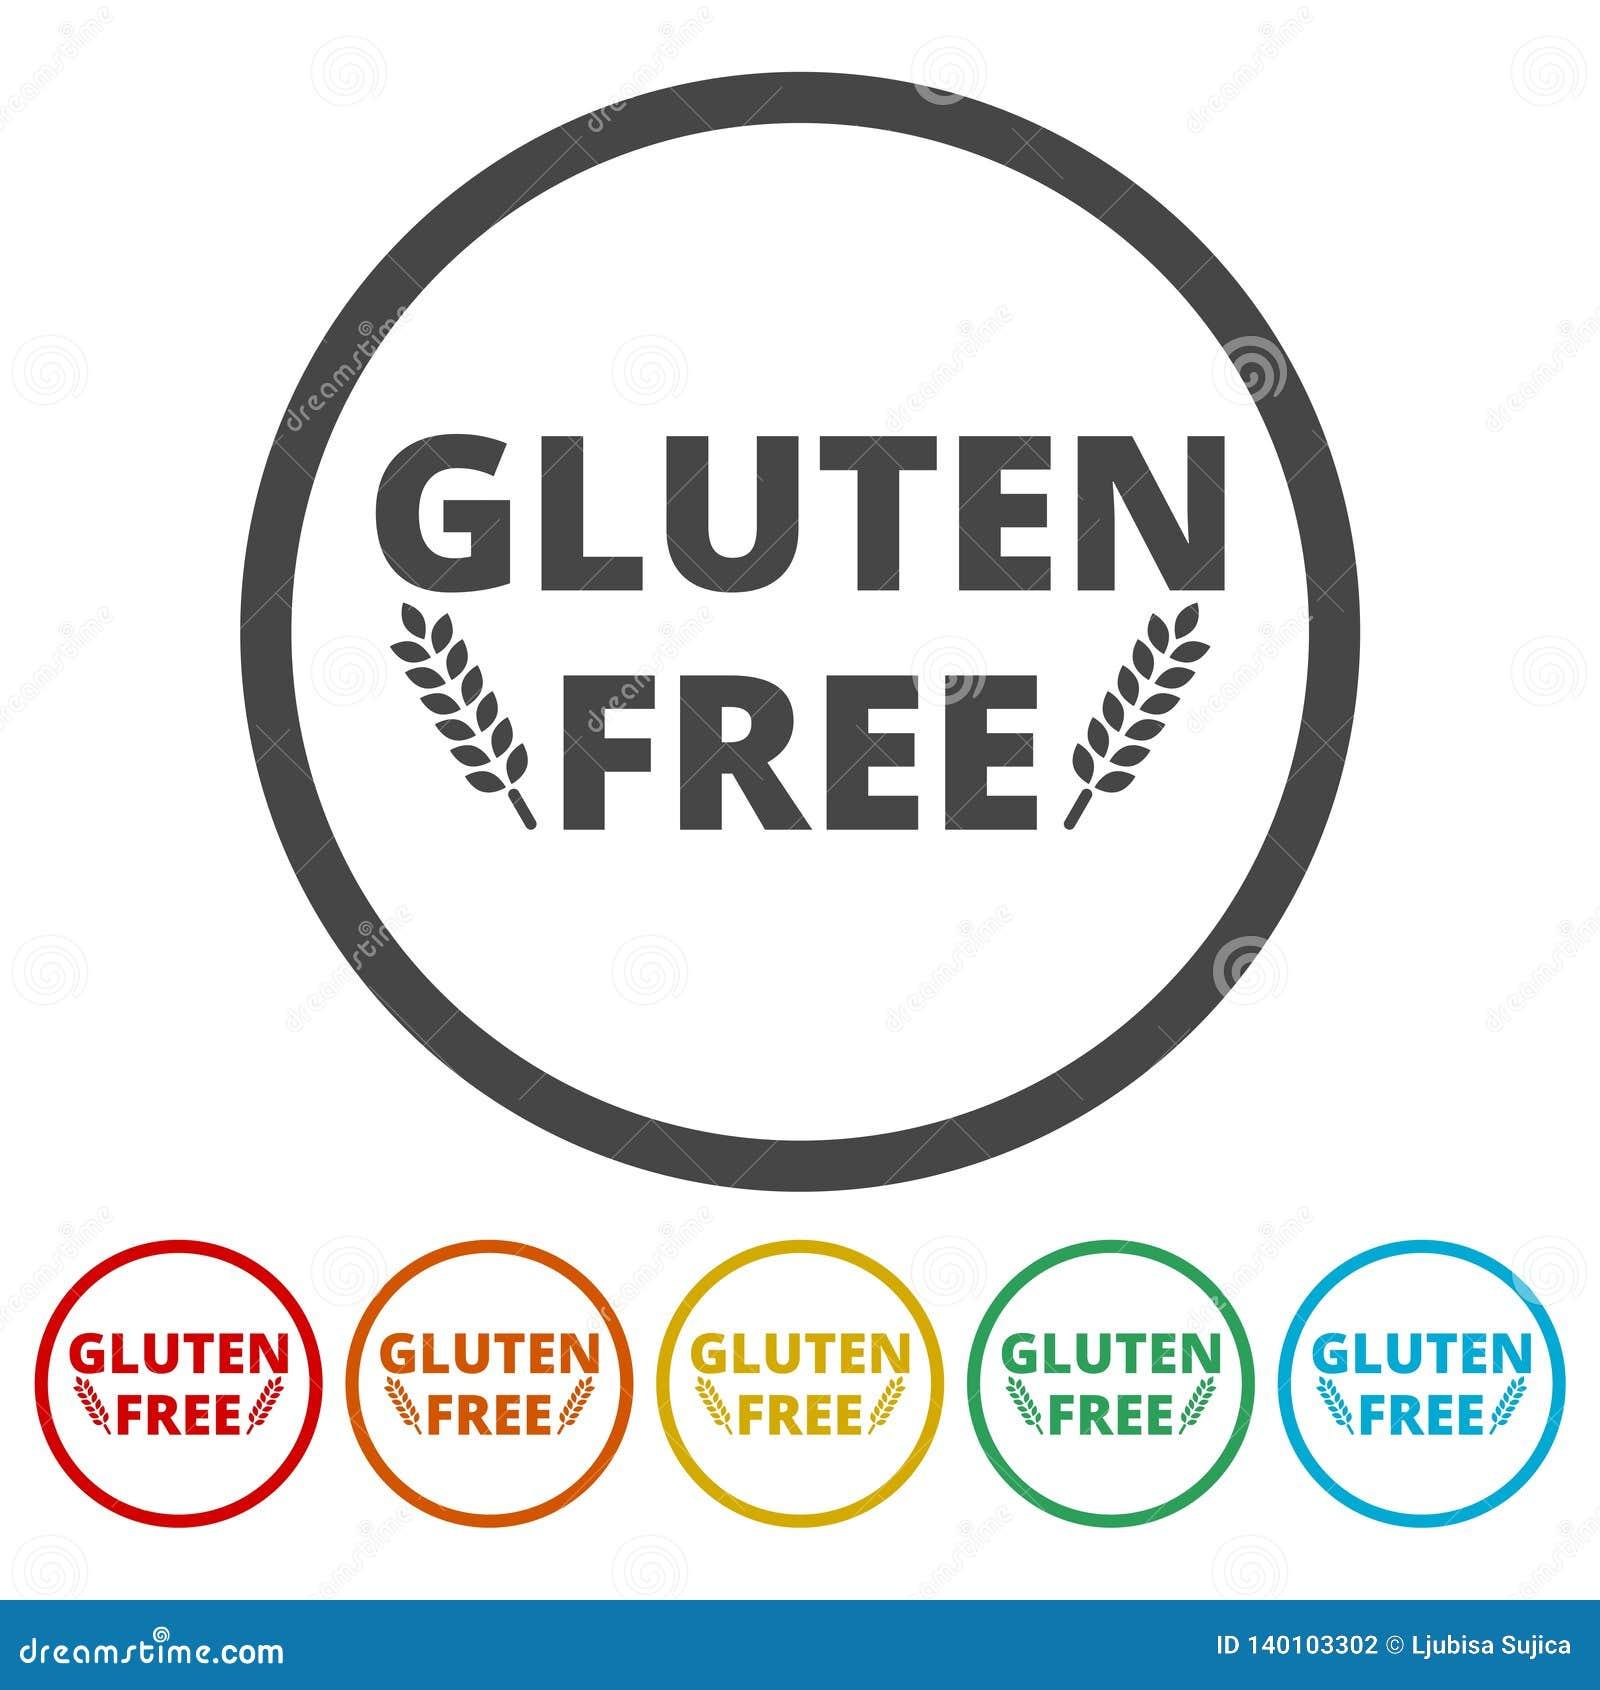 Gluten free icons set stock vector  Illustration of